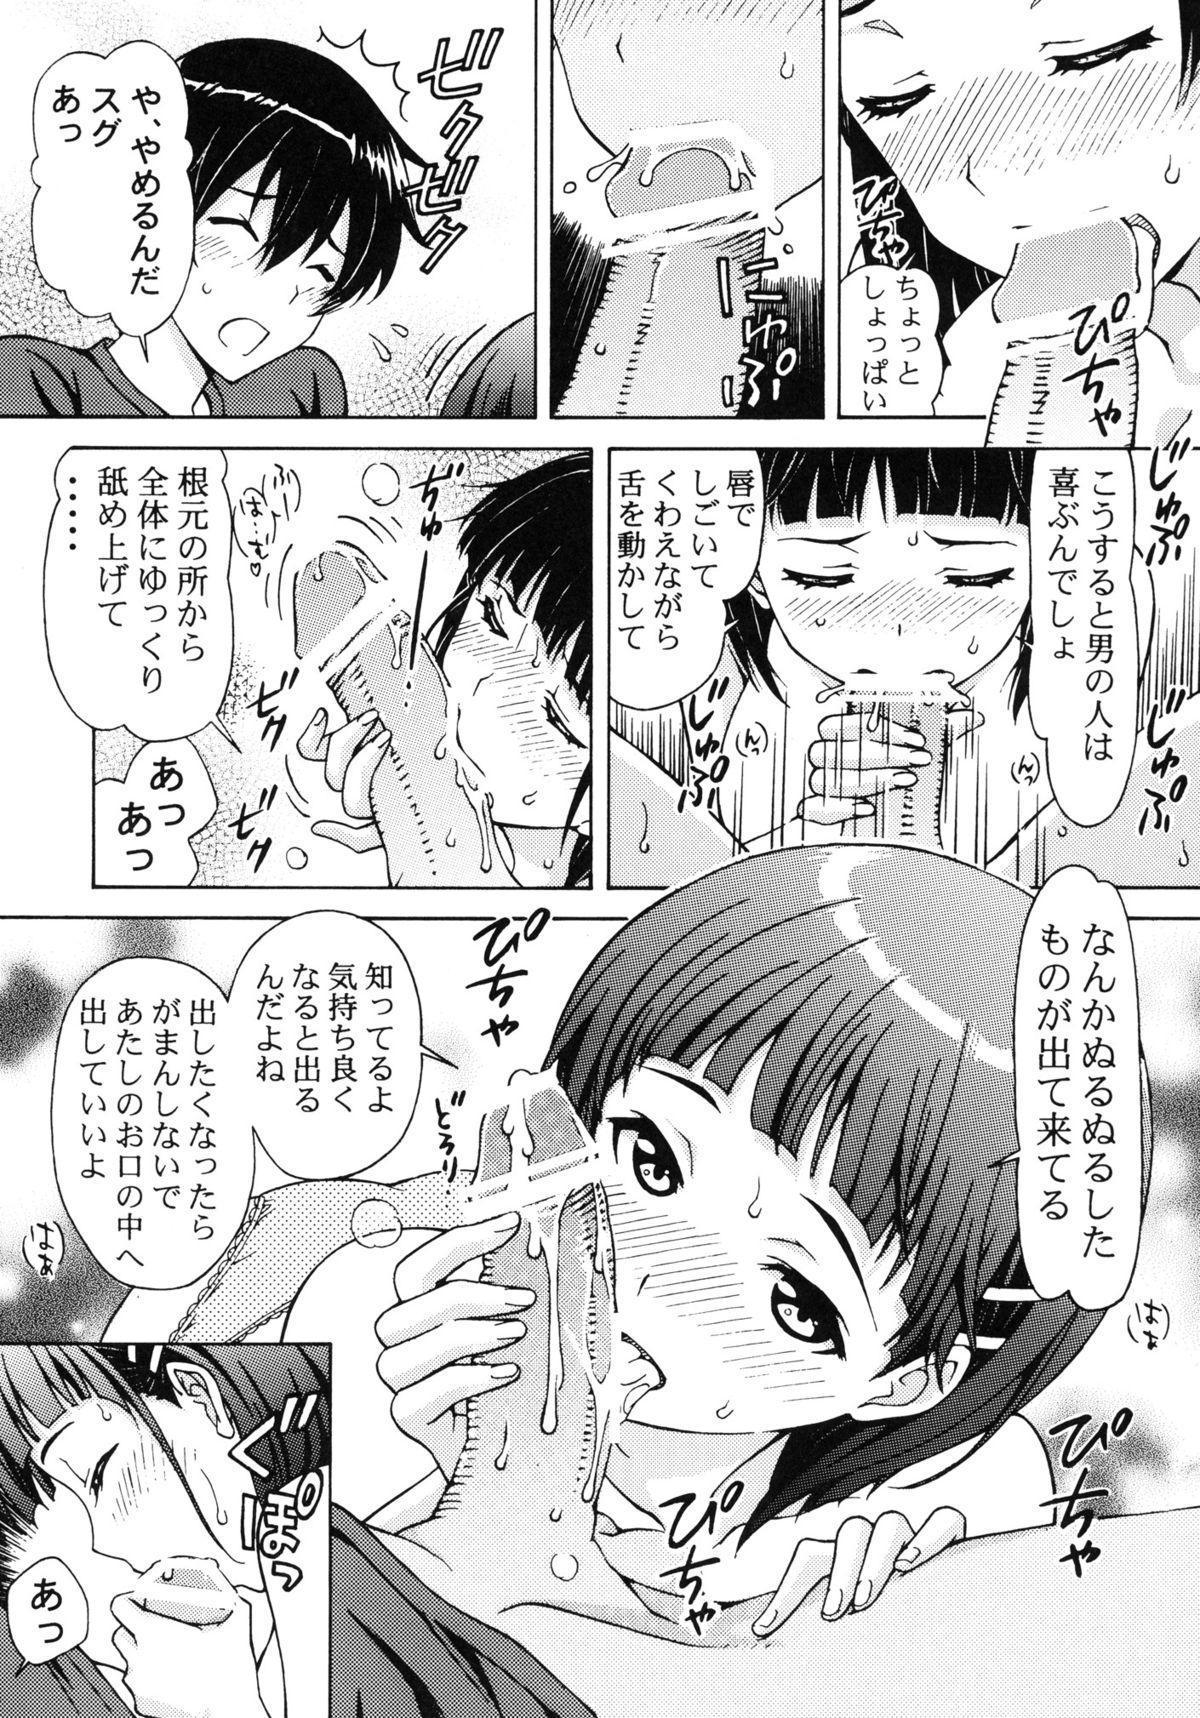 Kinshinsoukan - Nakadashi Suguha 9